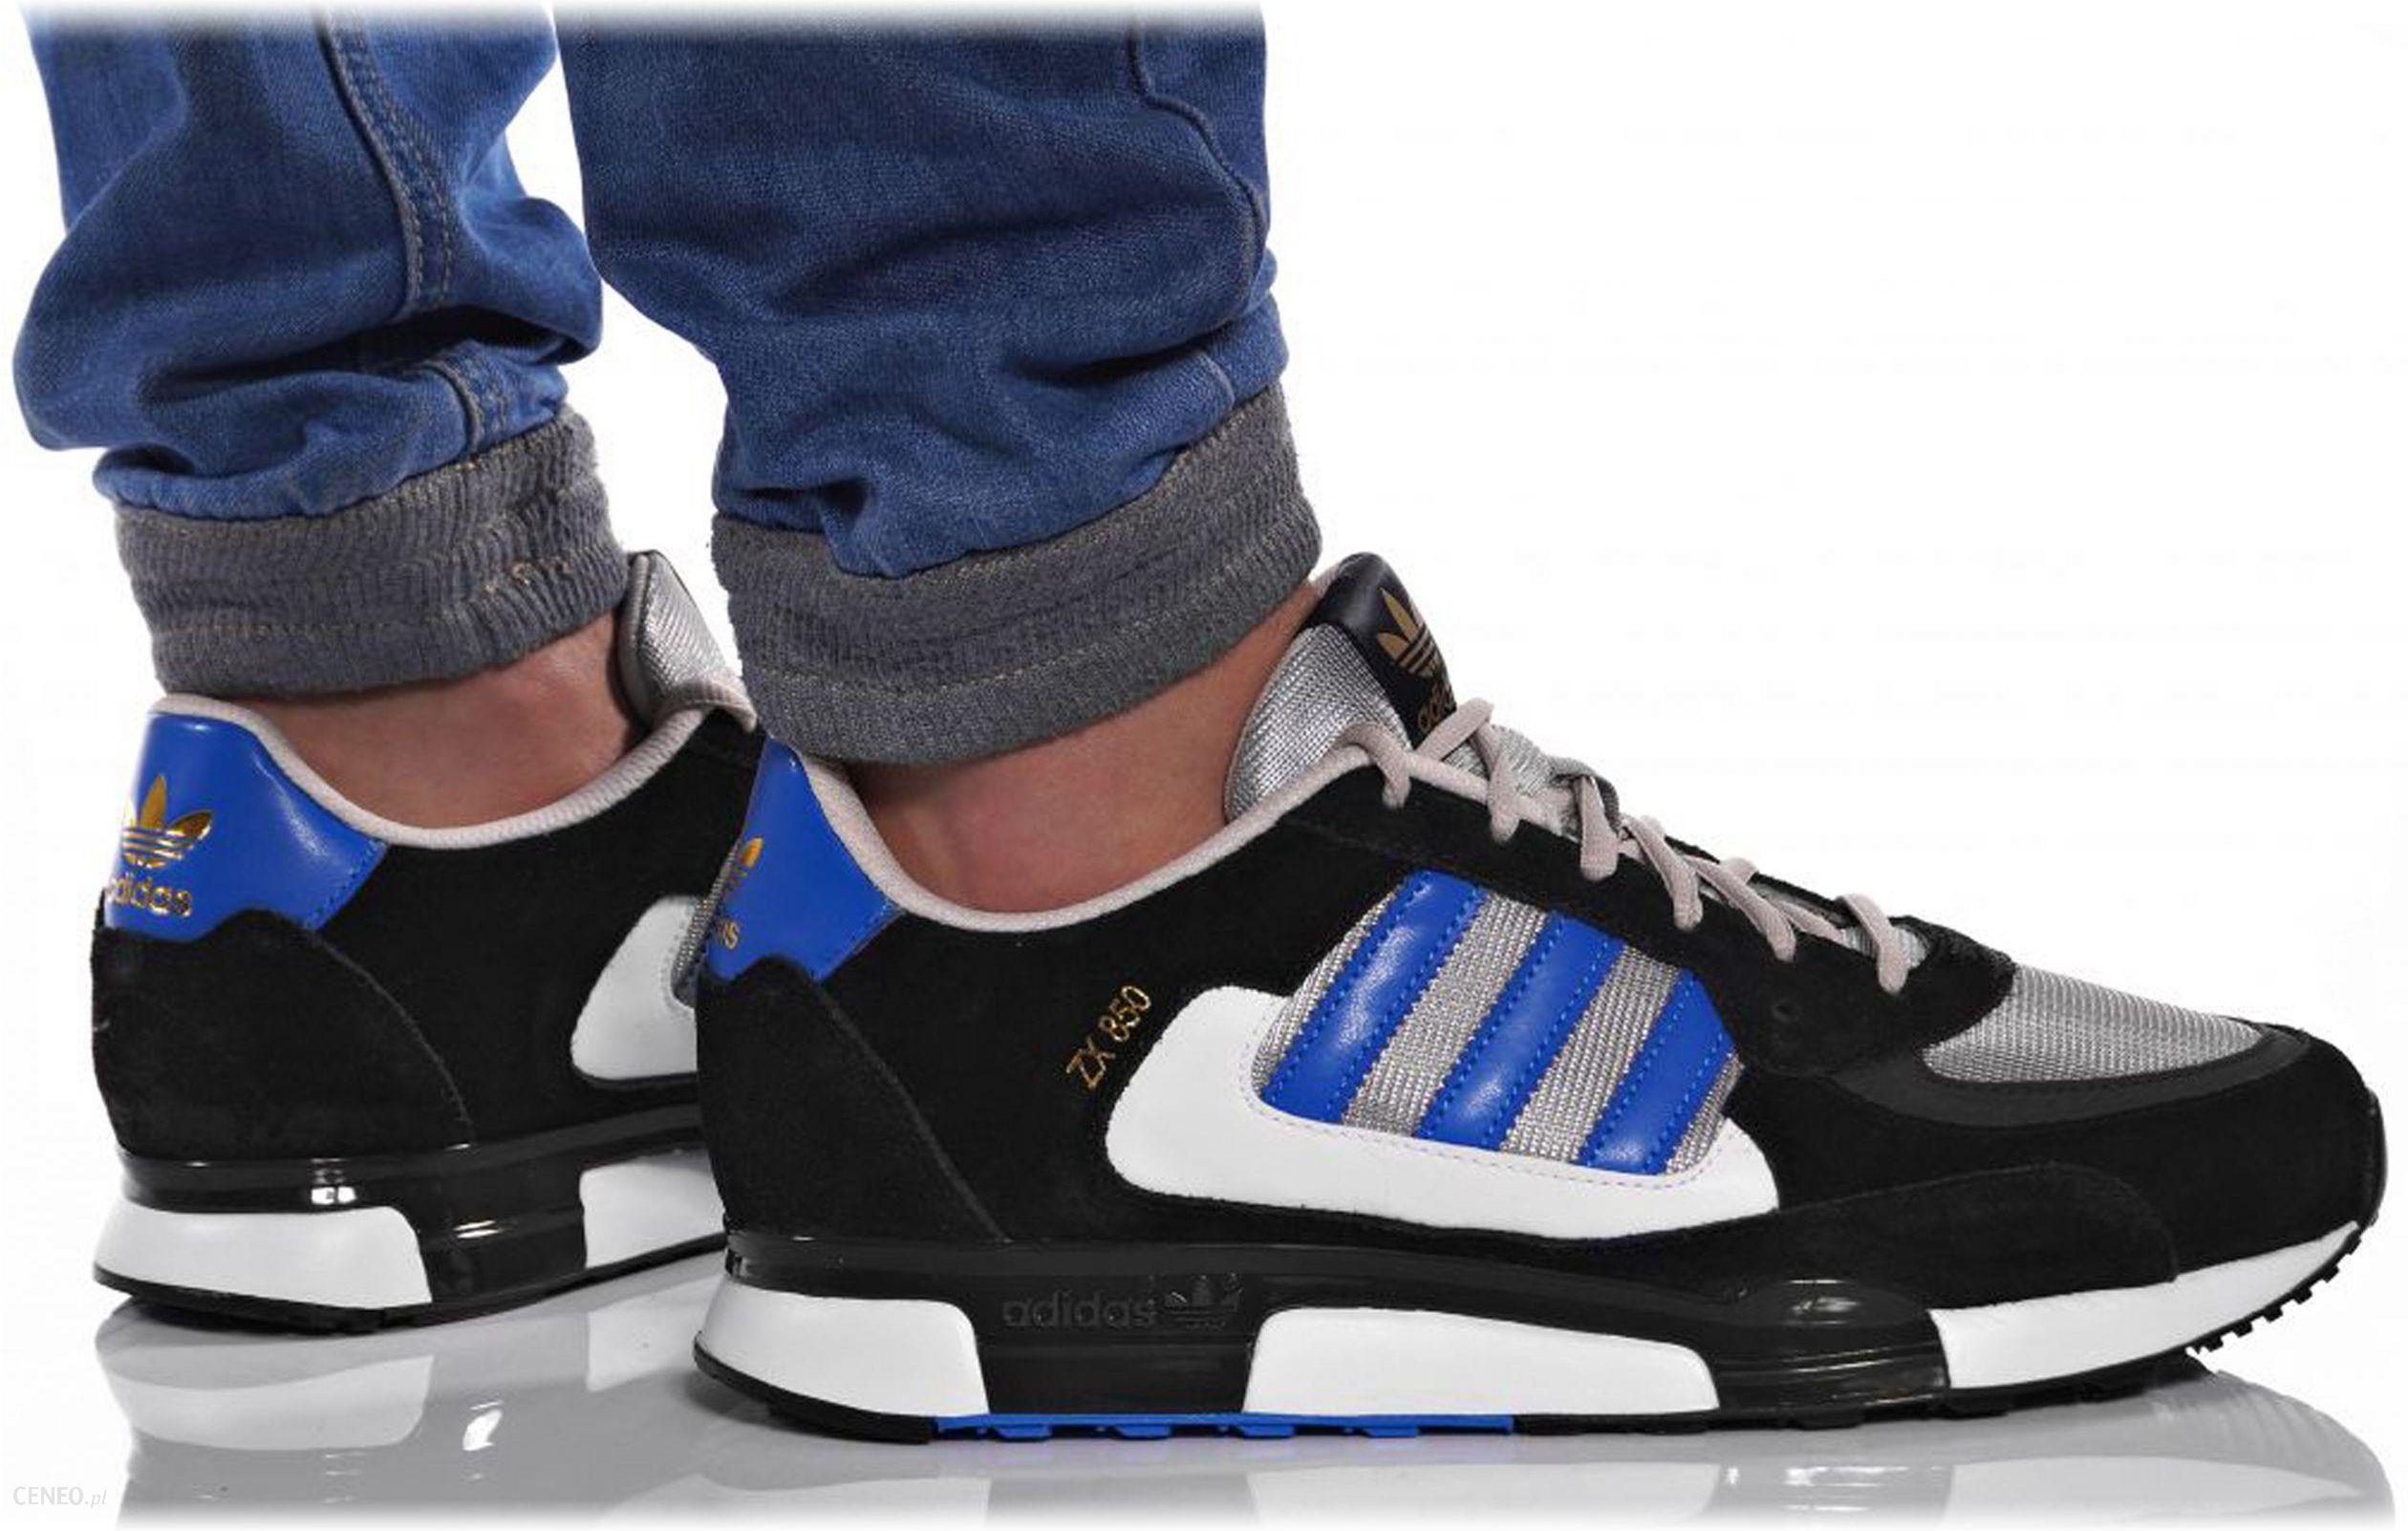 sports shoes 4434a 525d9 sweden adidas zx 850 ceneo bfc23 660e6